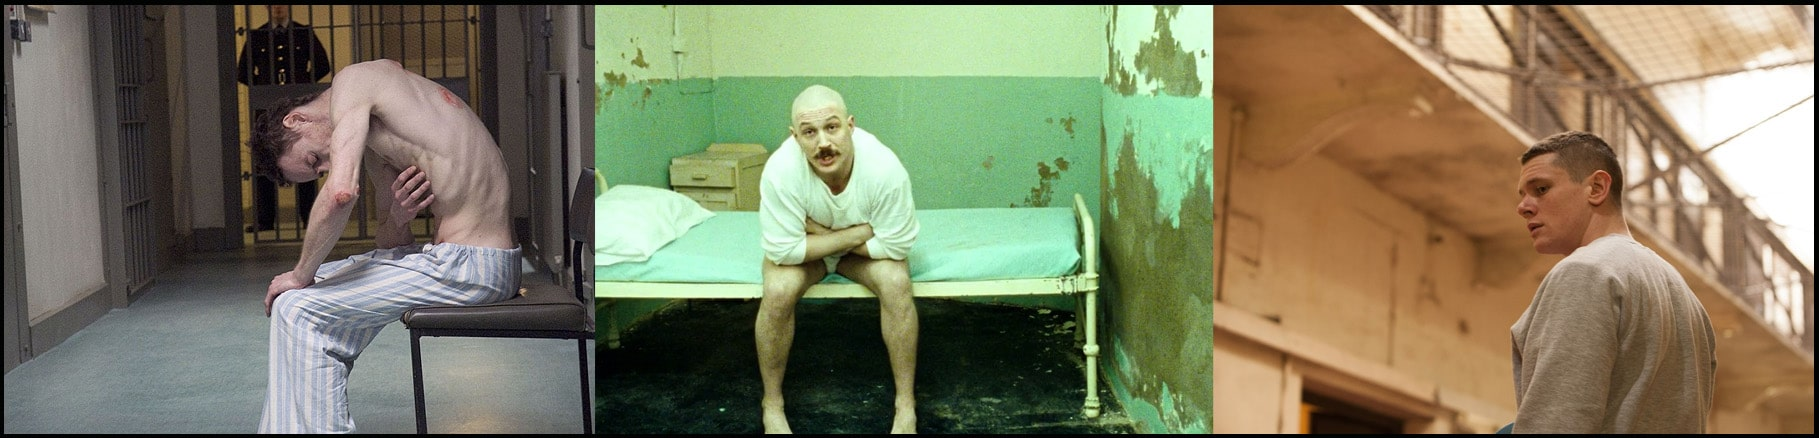 Gefängnisdramen